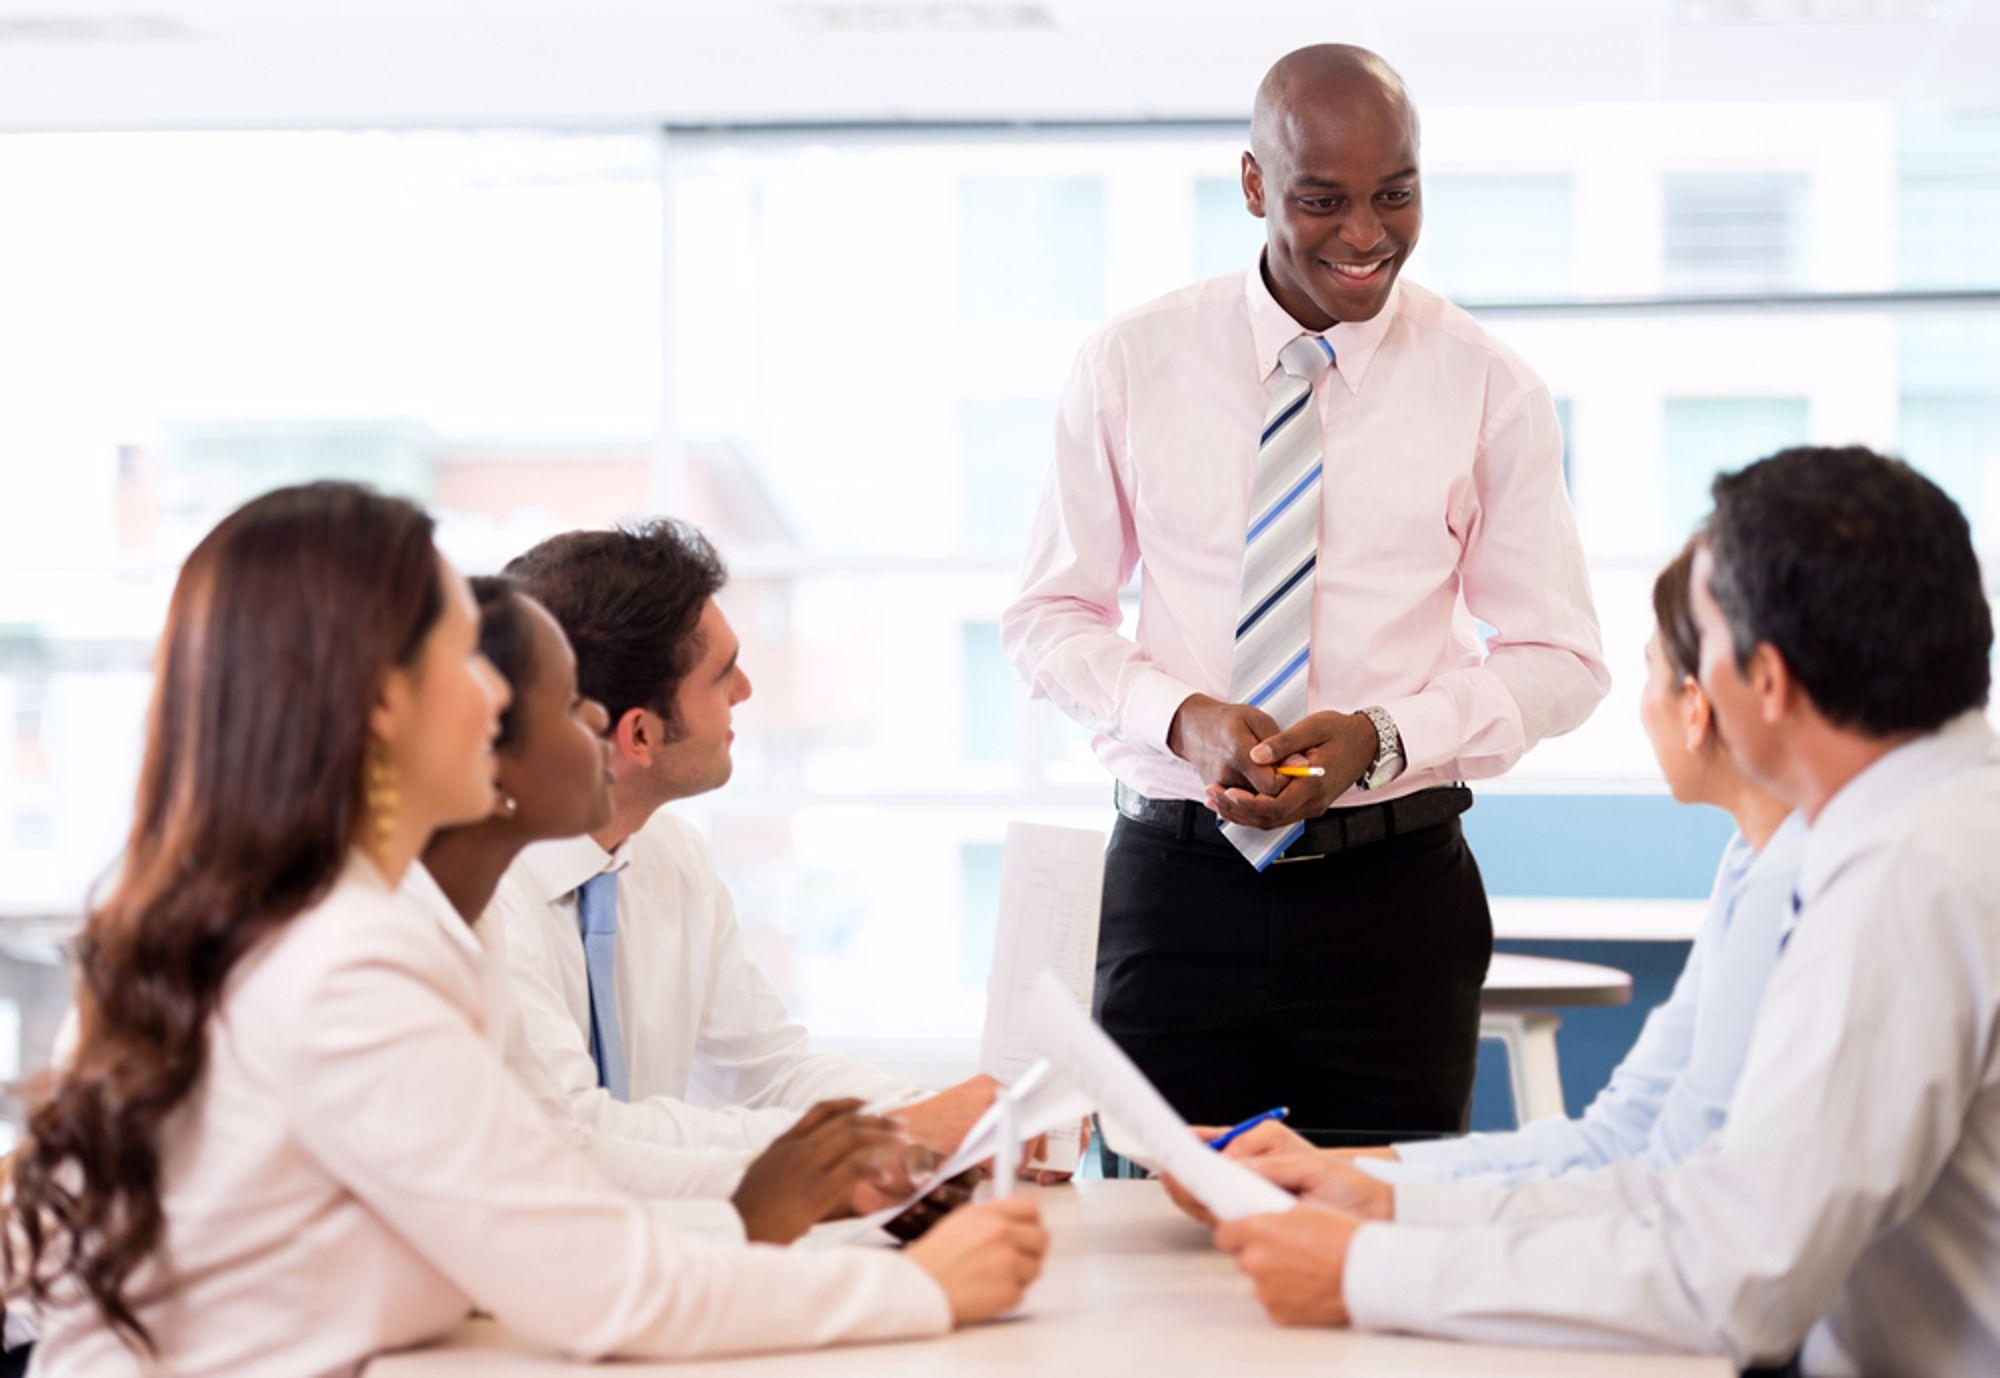 Man leading team meeting